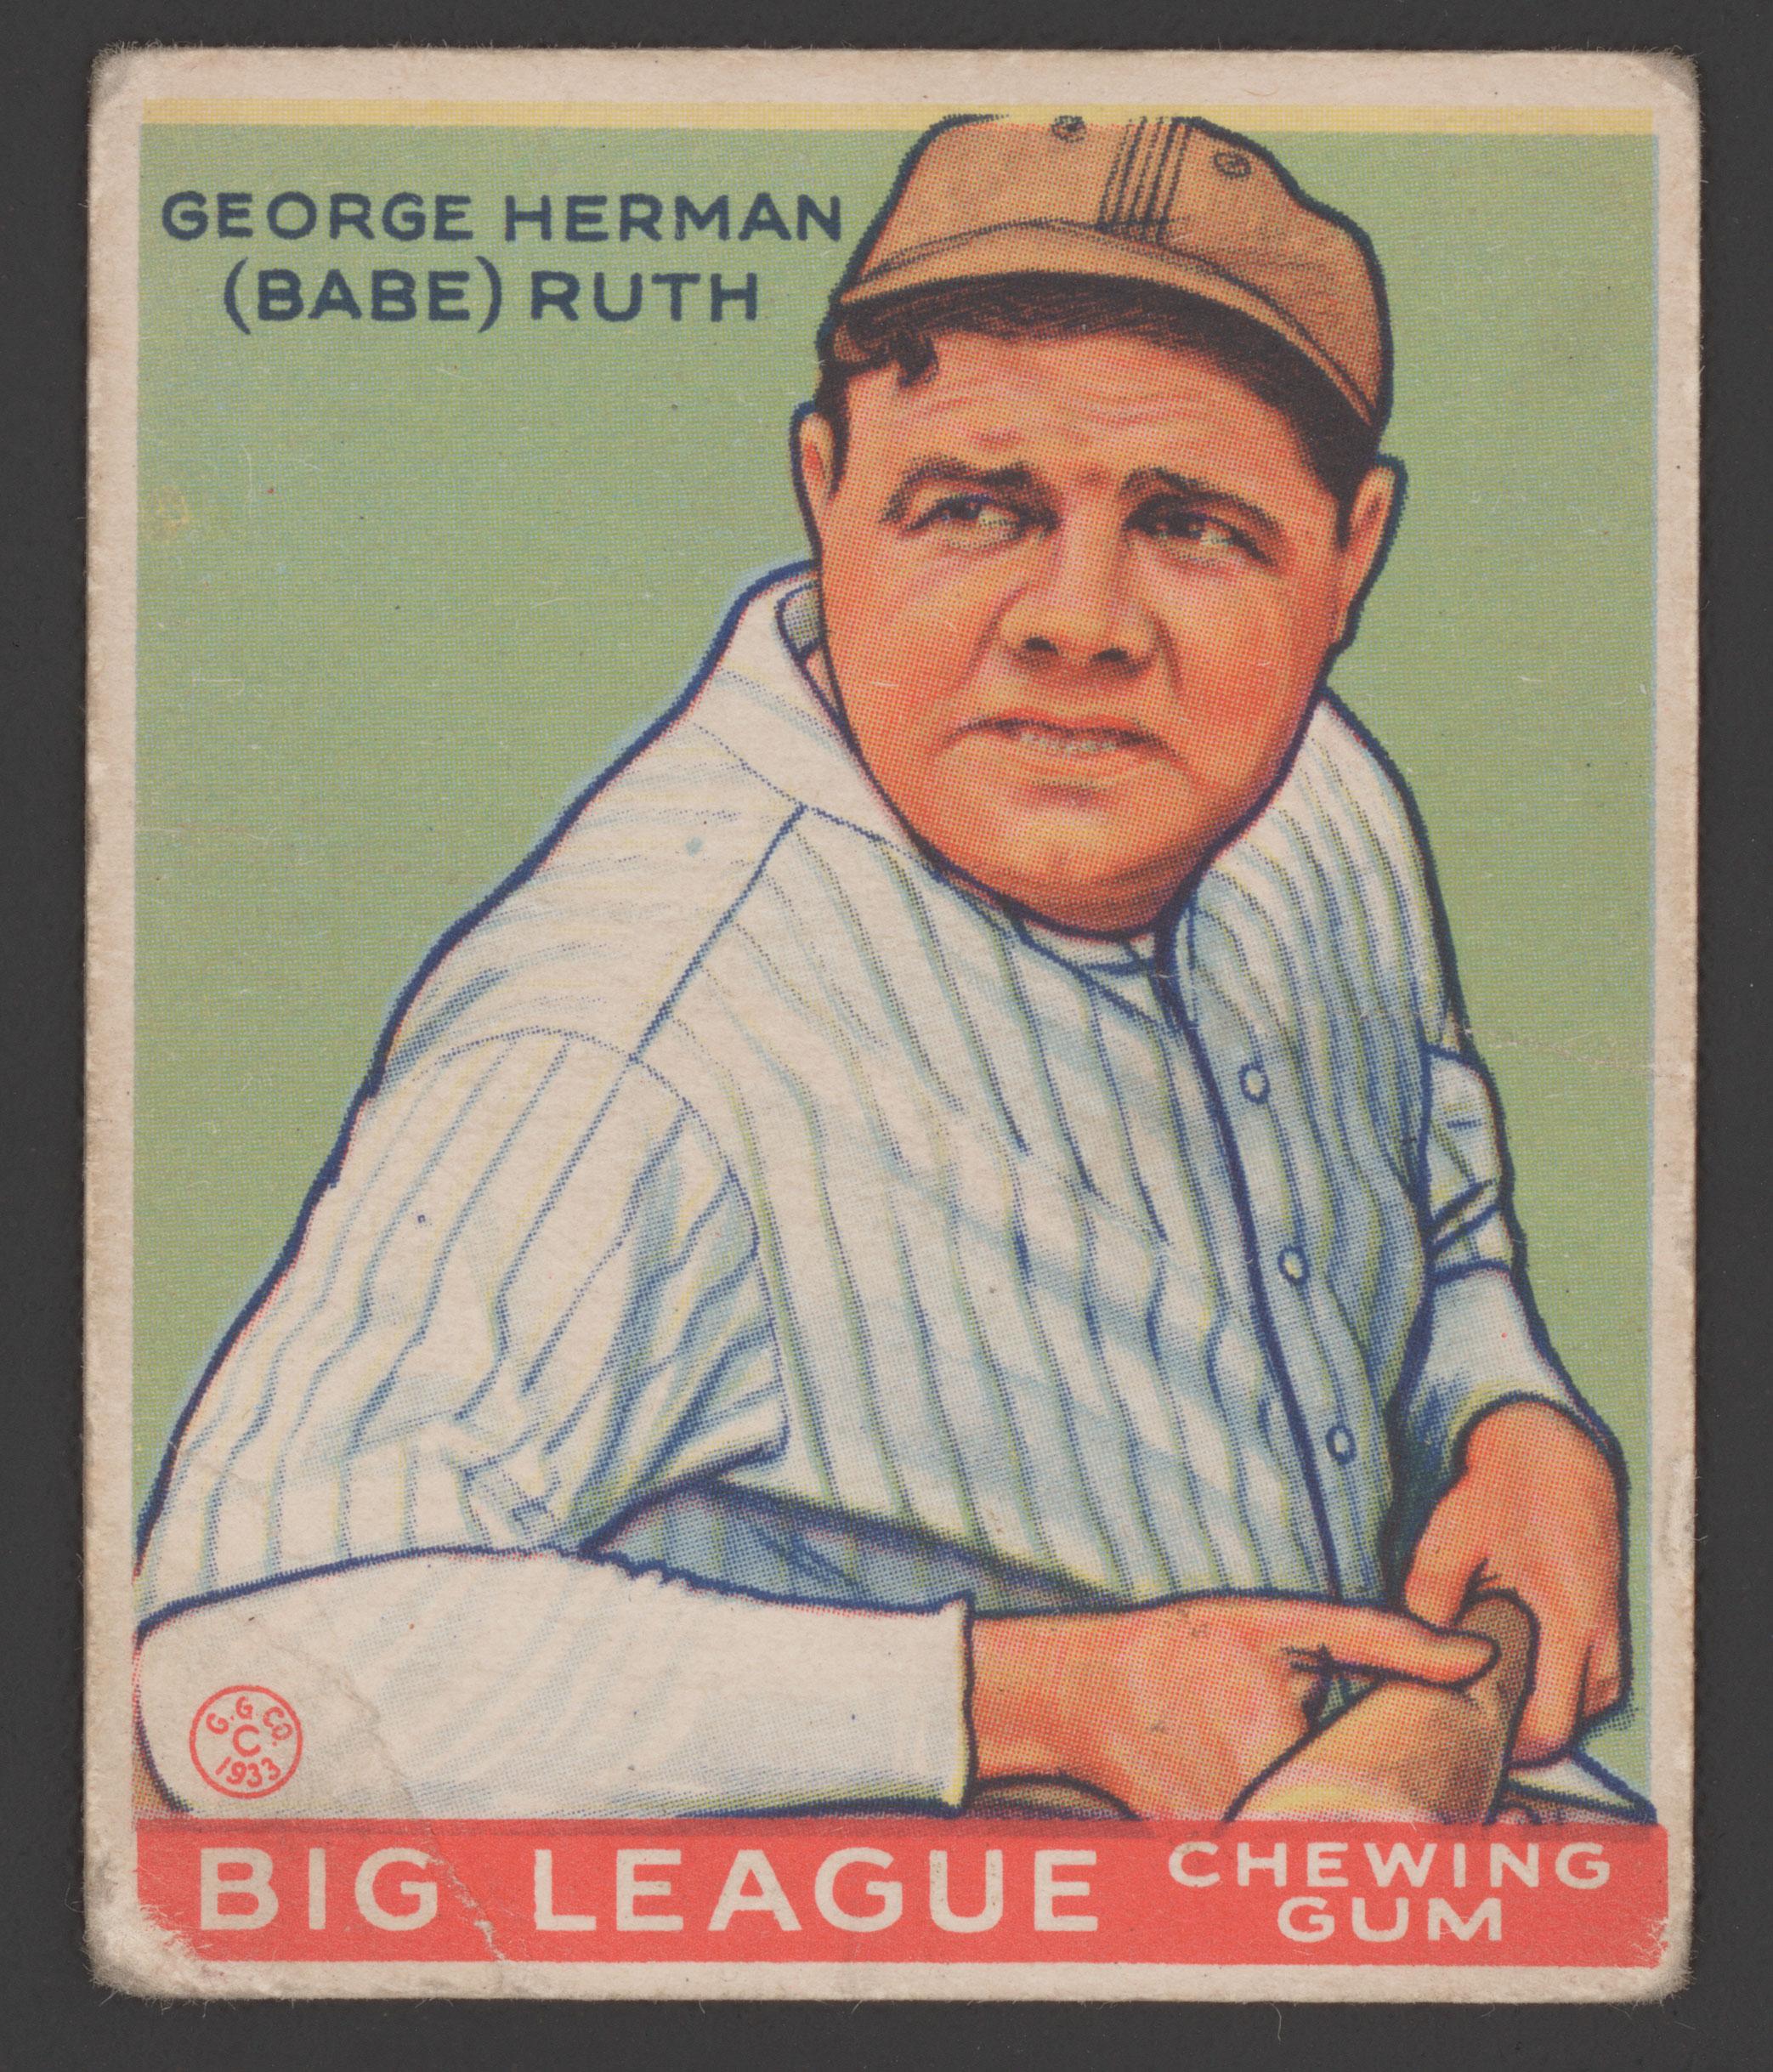 George Herman (Babe) Ruth, Big League Chewing Gum baseball card. Boston : Goudey Gum Co., 1933.